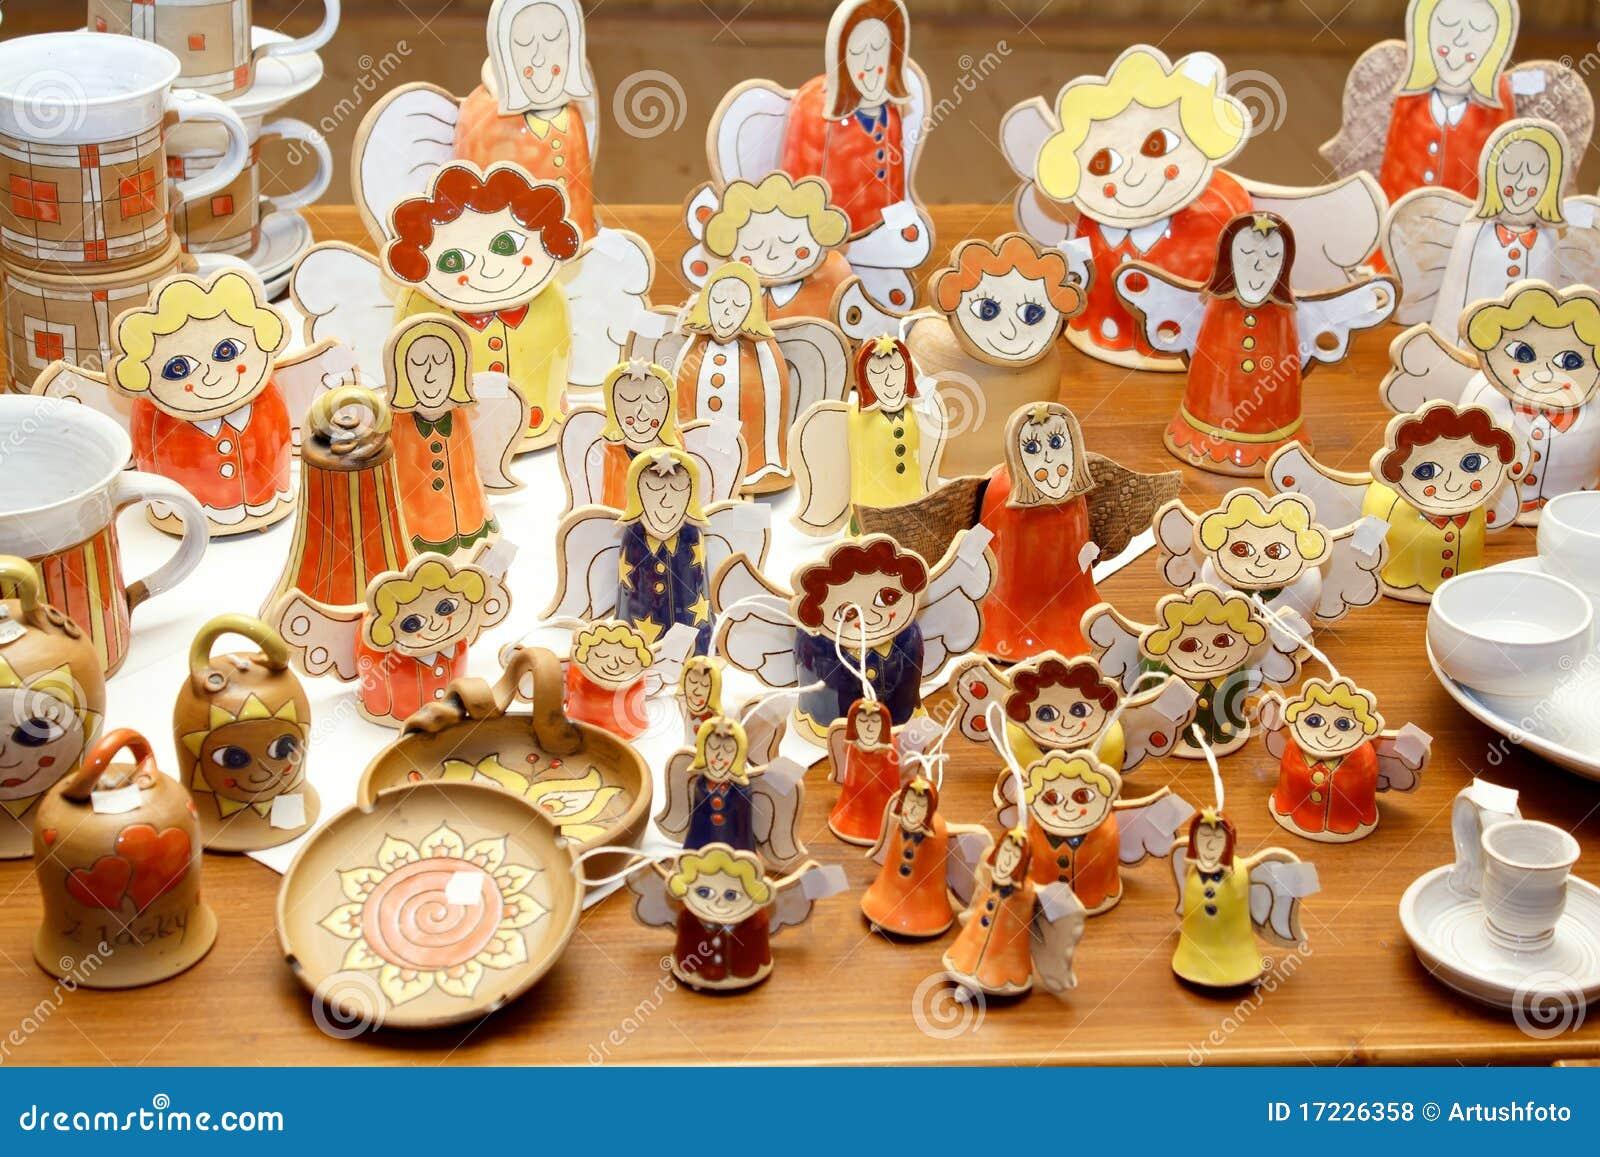 Decorazioni di ceramica fatte a mano di natale fotografie for Creazioni di natale fatte a mano